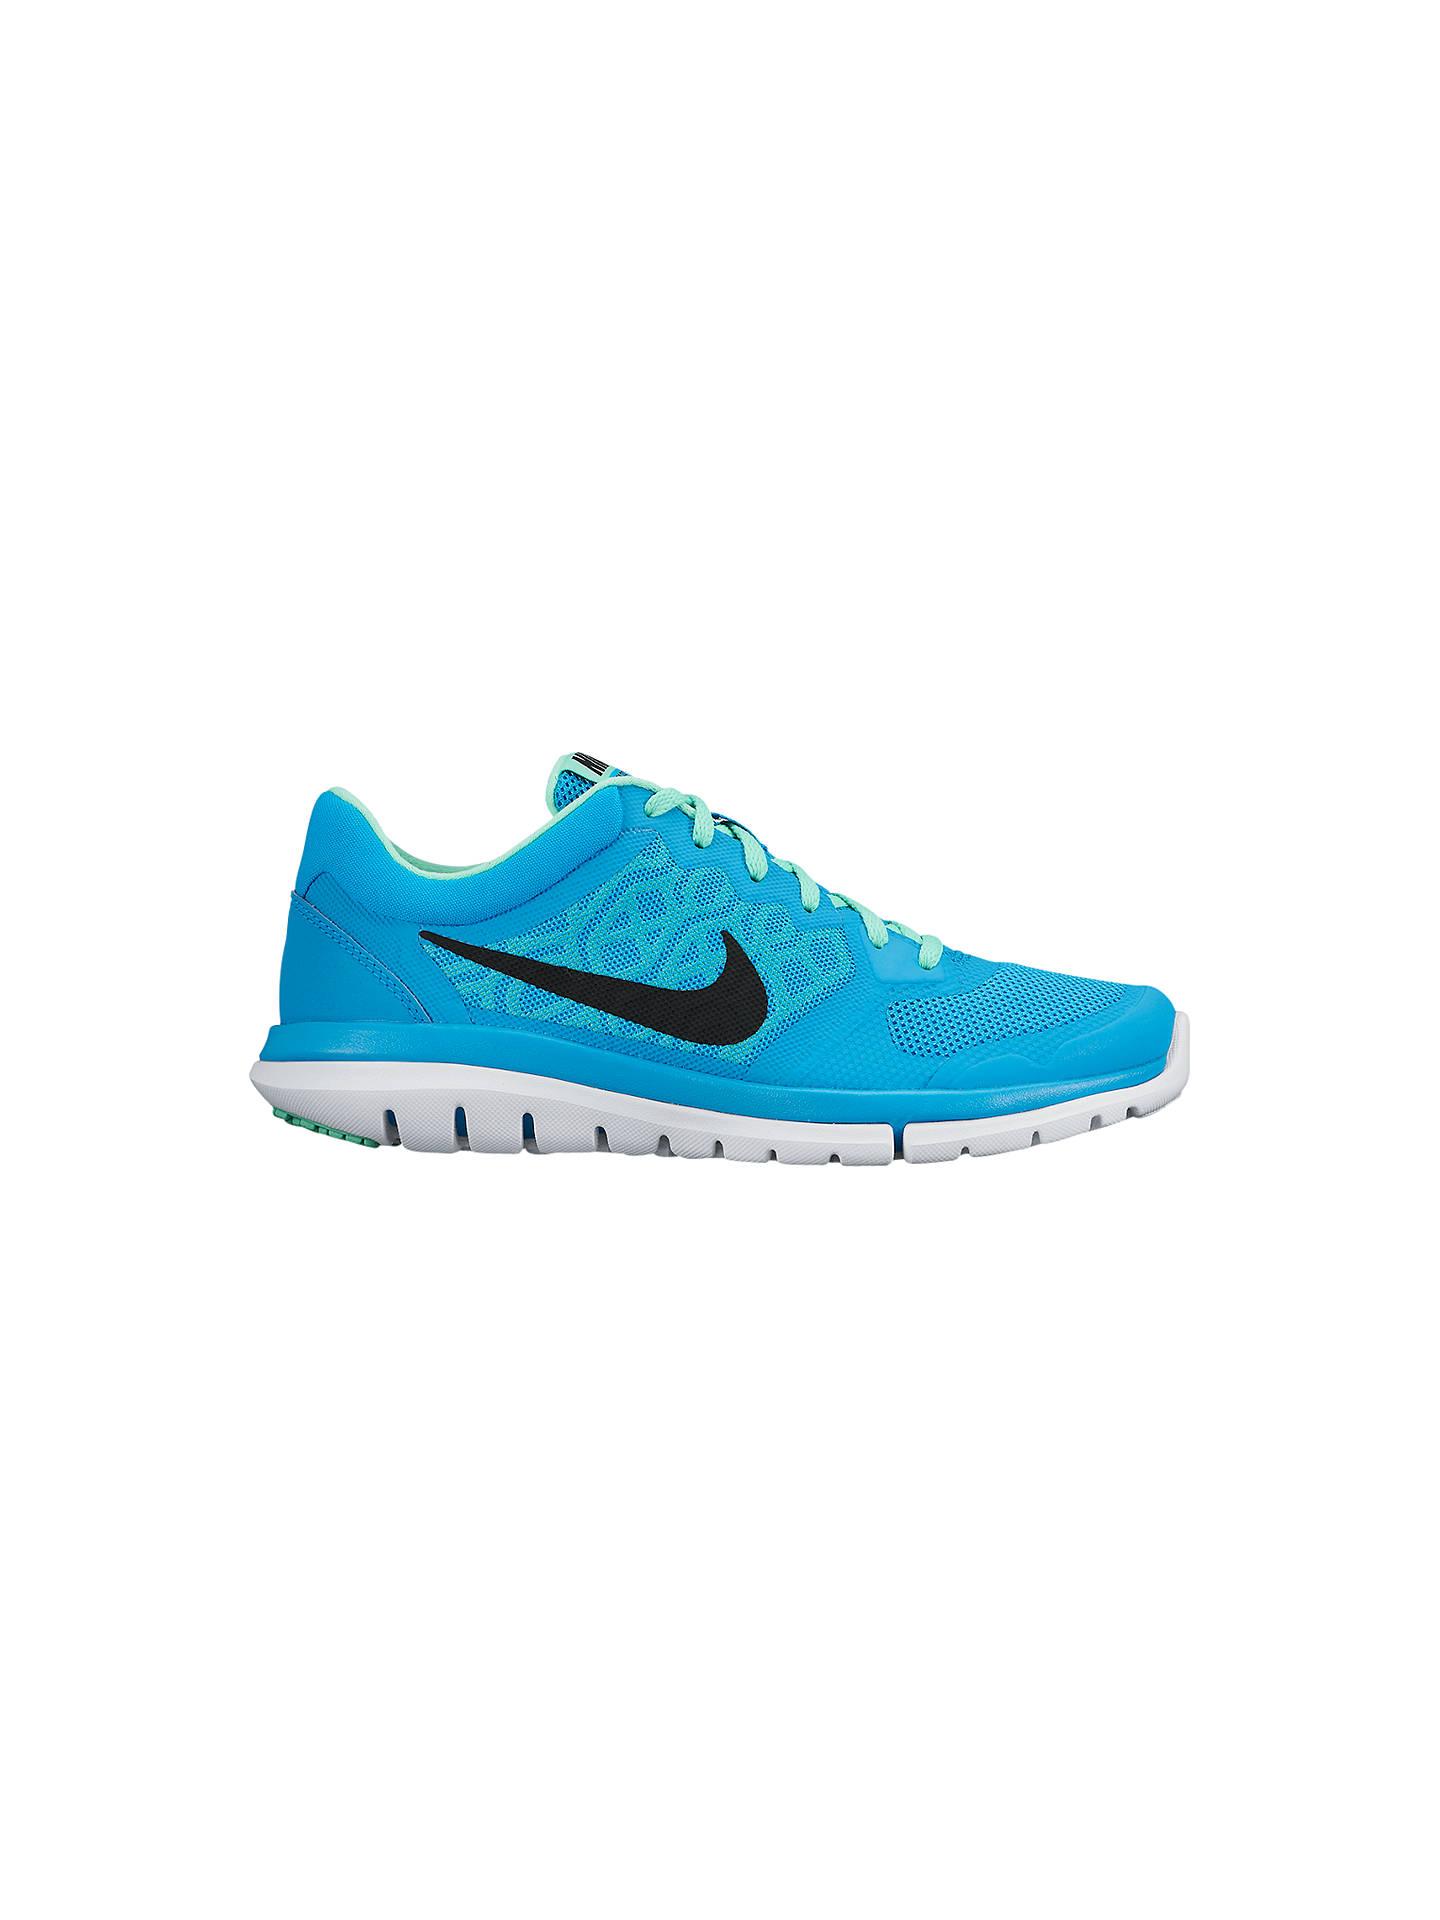 sale retailer 3c284 dd1d6 Buy Nike Flex Run 2015 Women s Running Shoes, Blue, 4 Online at johnlewis.